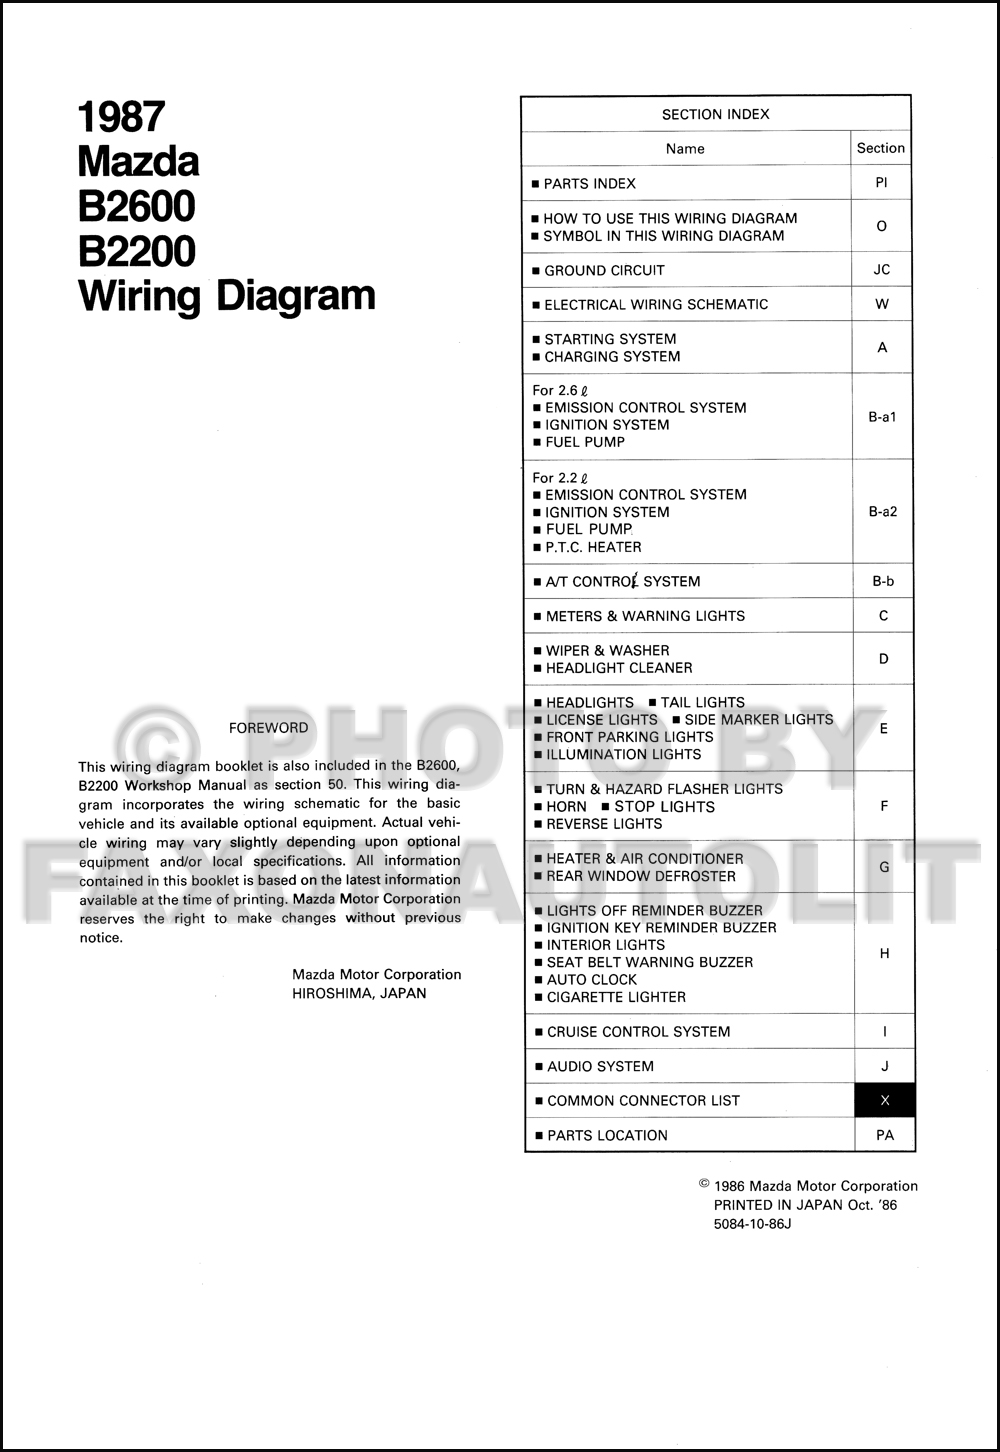 1987MazdaB2600B2200OWD TOC 1987 mazda b2200 b2600 pickup truck wiring diagram manual original 1987 mazda b2000 spark plug wiring diagram at creativeand.co